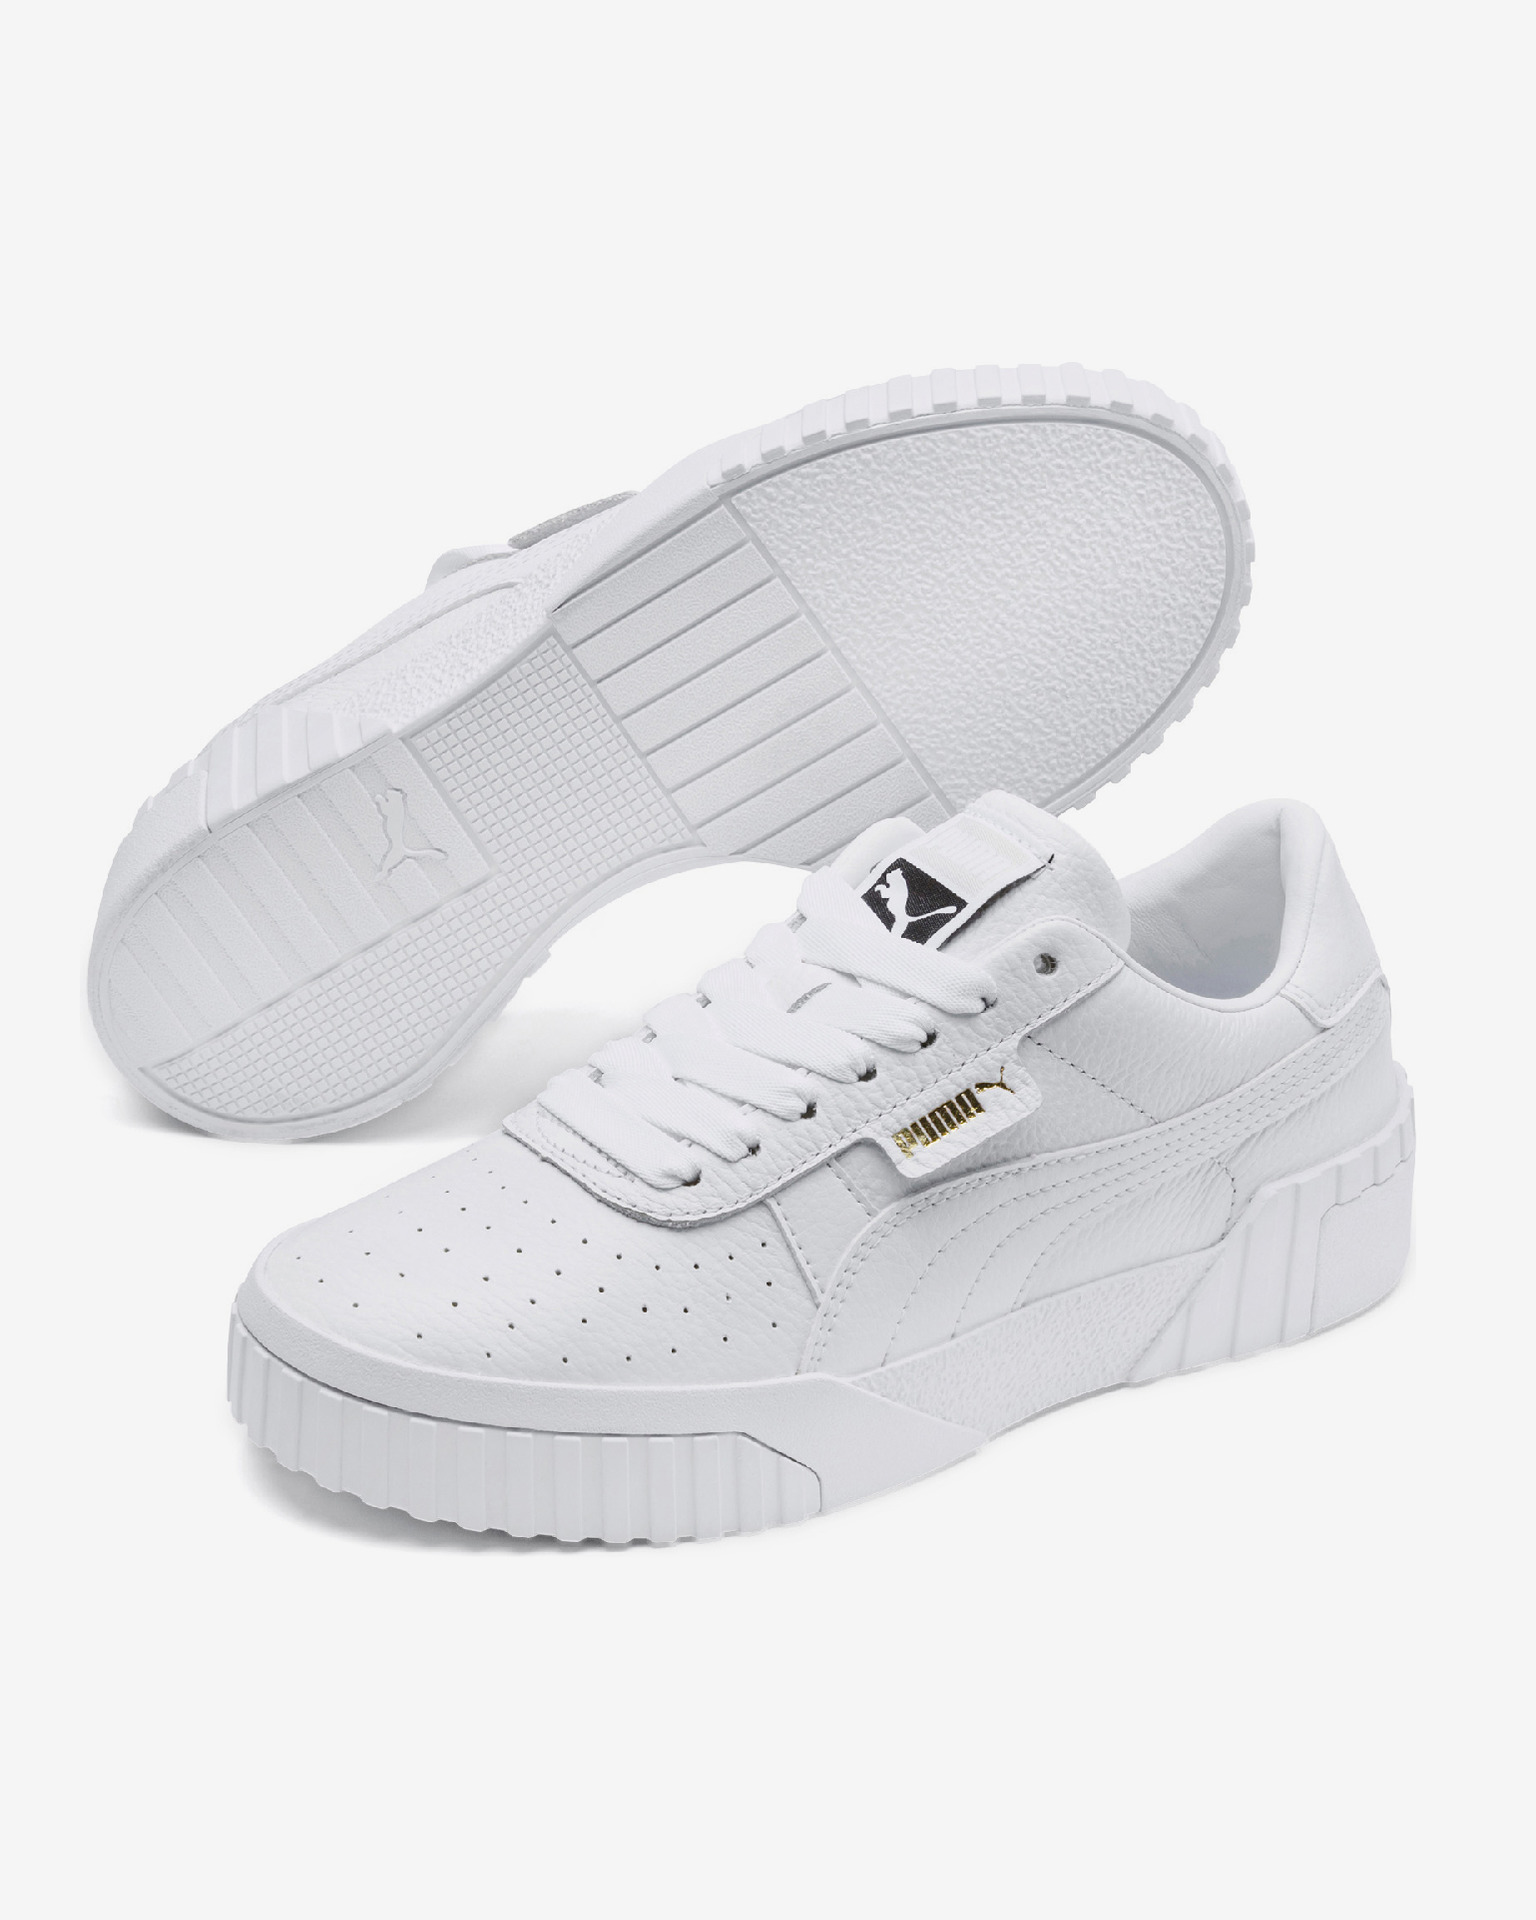 Puma - Cali Sneakers Bibloo.com